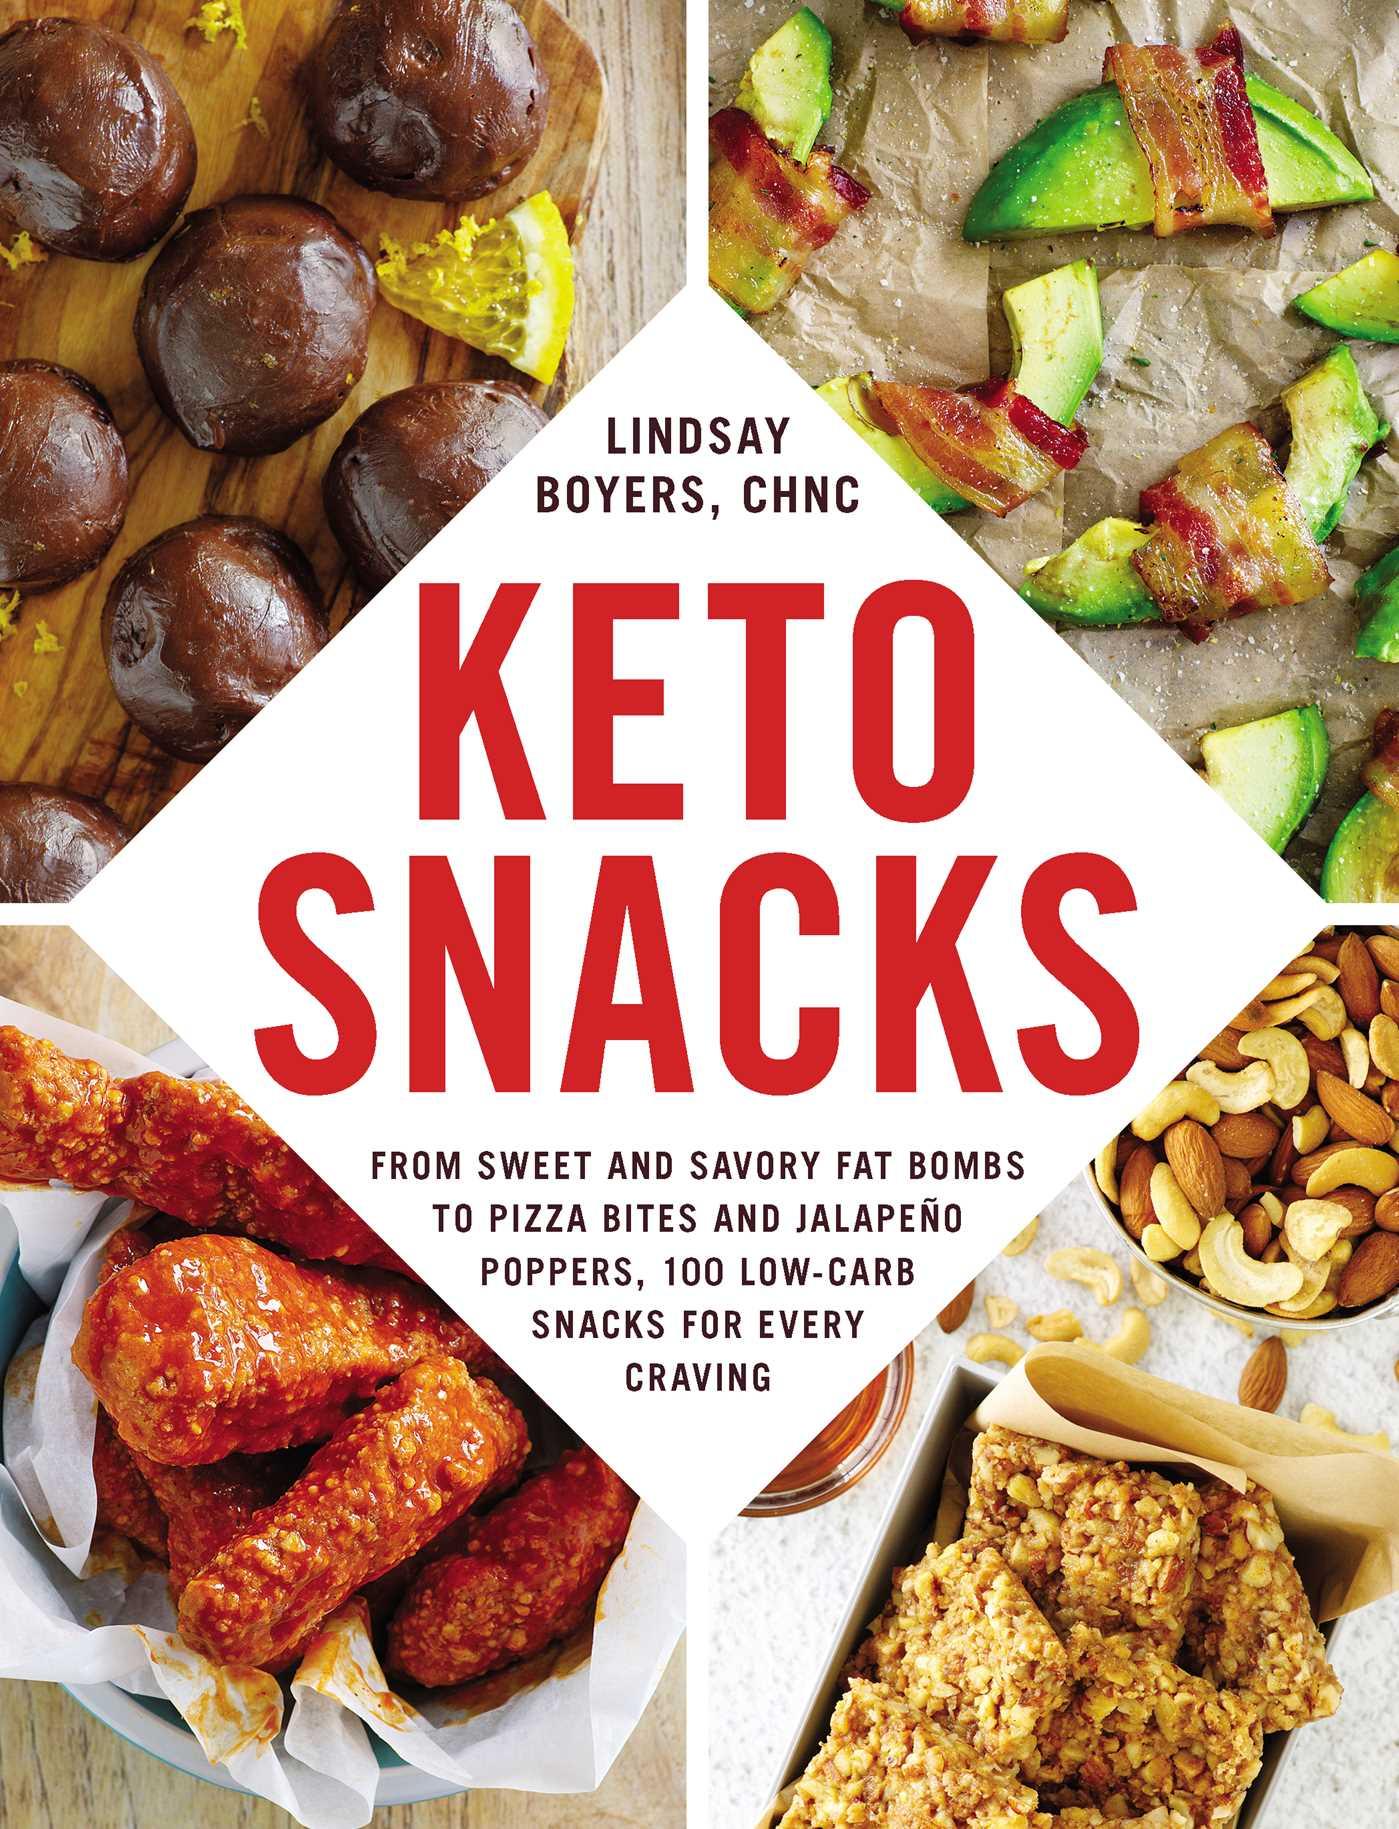 Keto snacks 9781507209202 hr